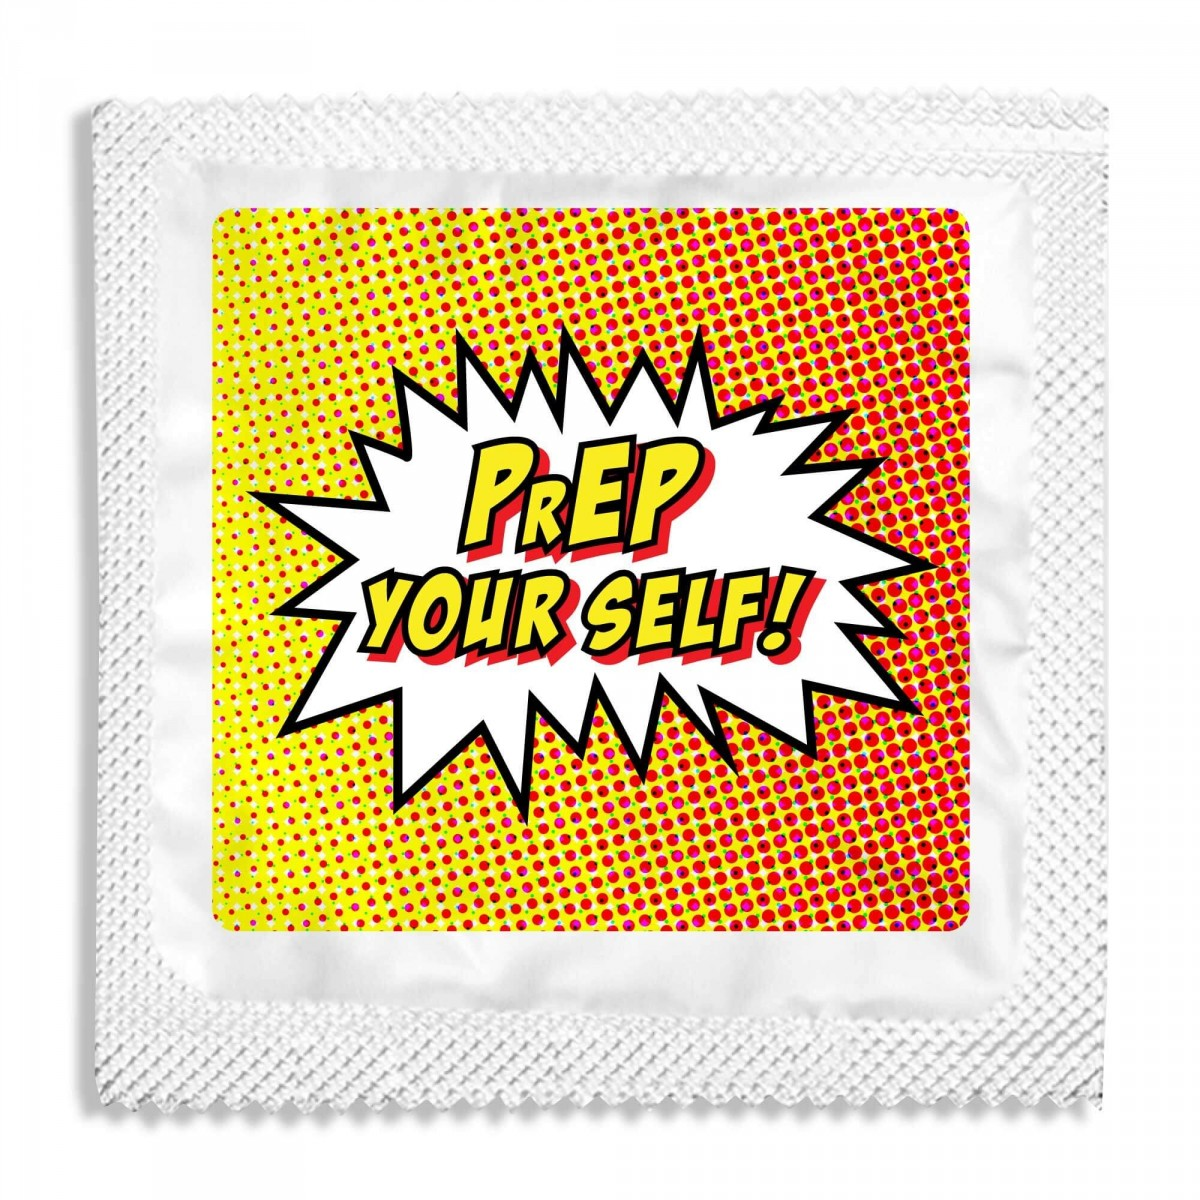 PrEP Yourself Condom